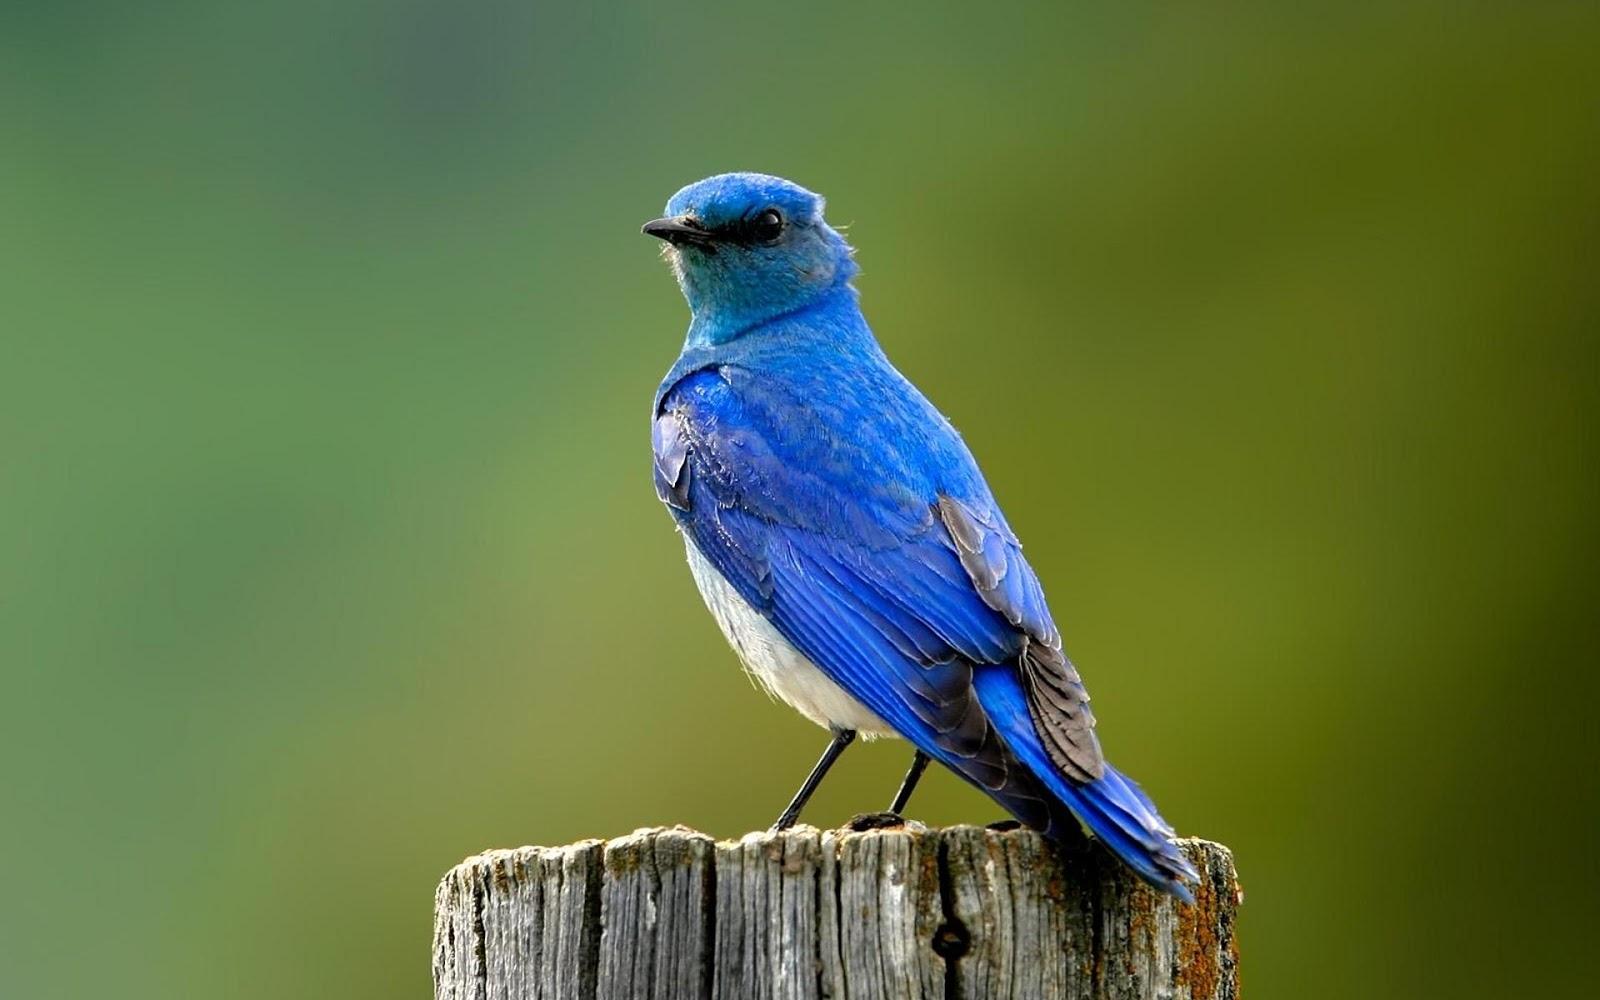 Blue Birds HD Wallpapers